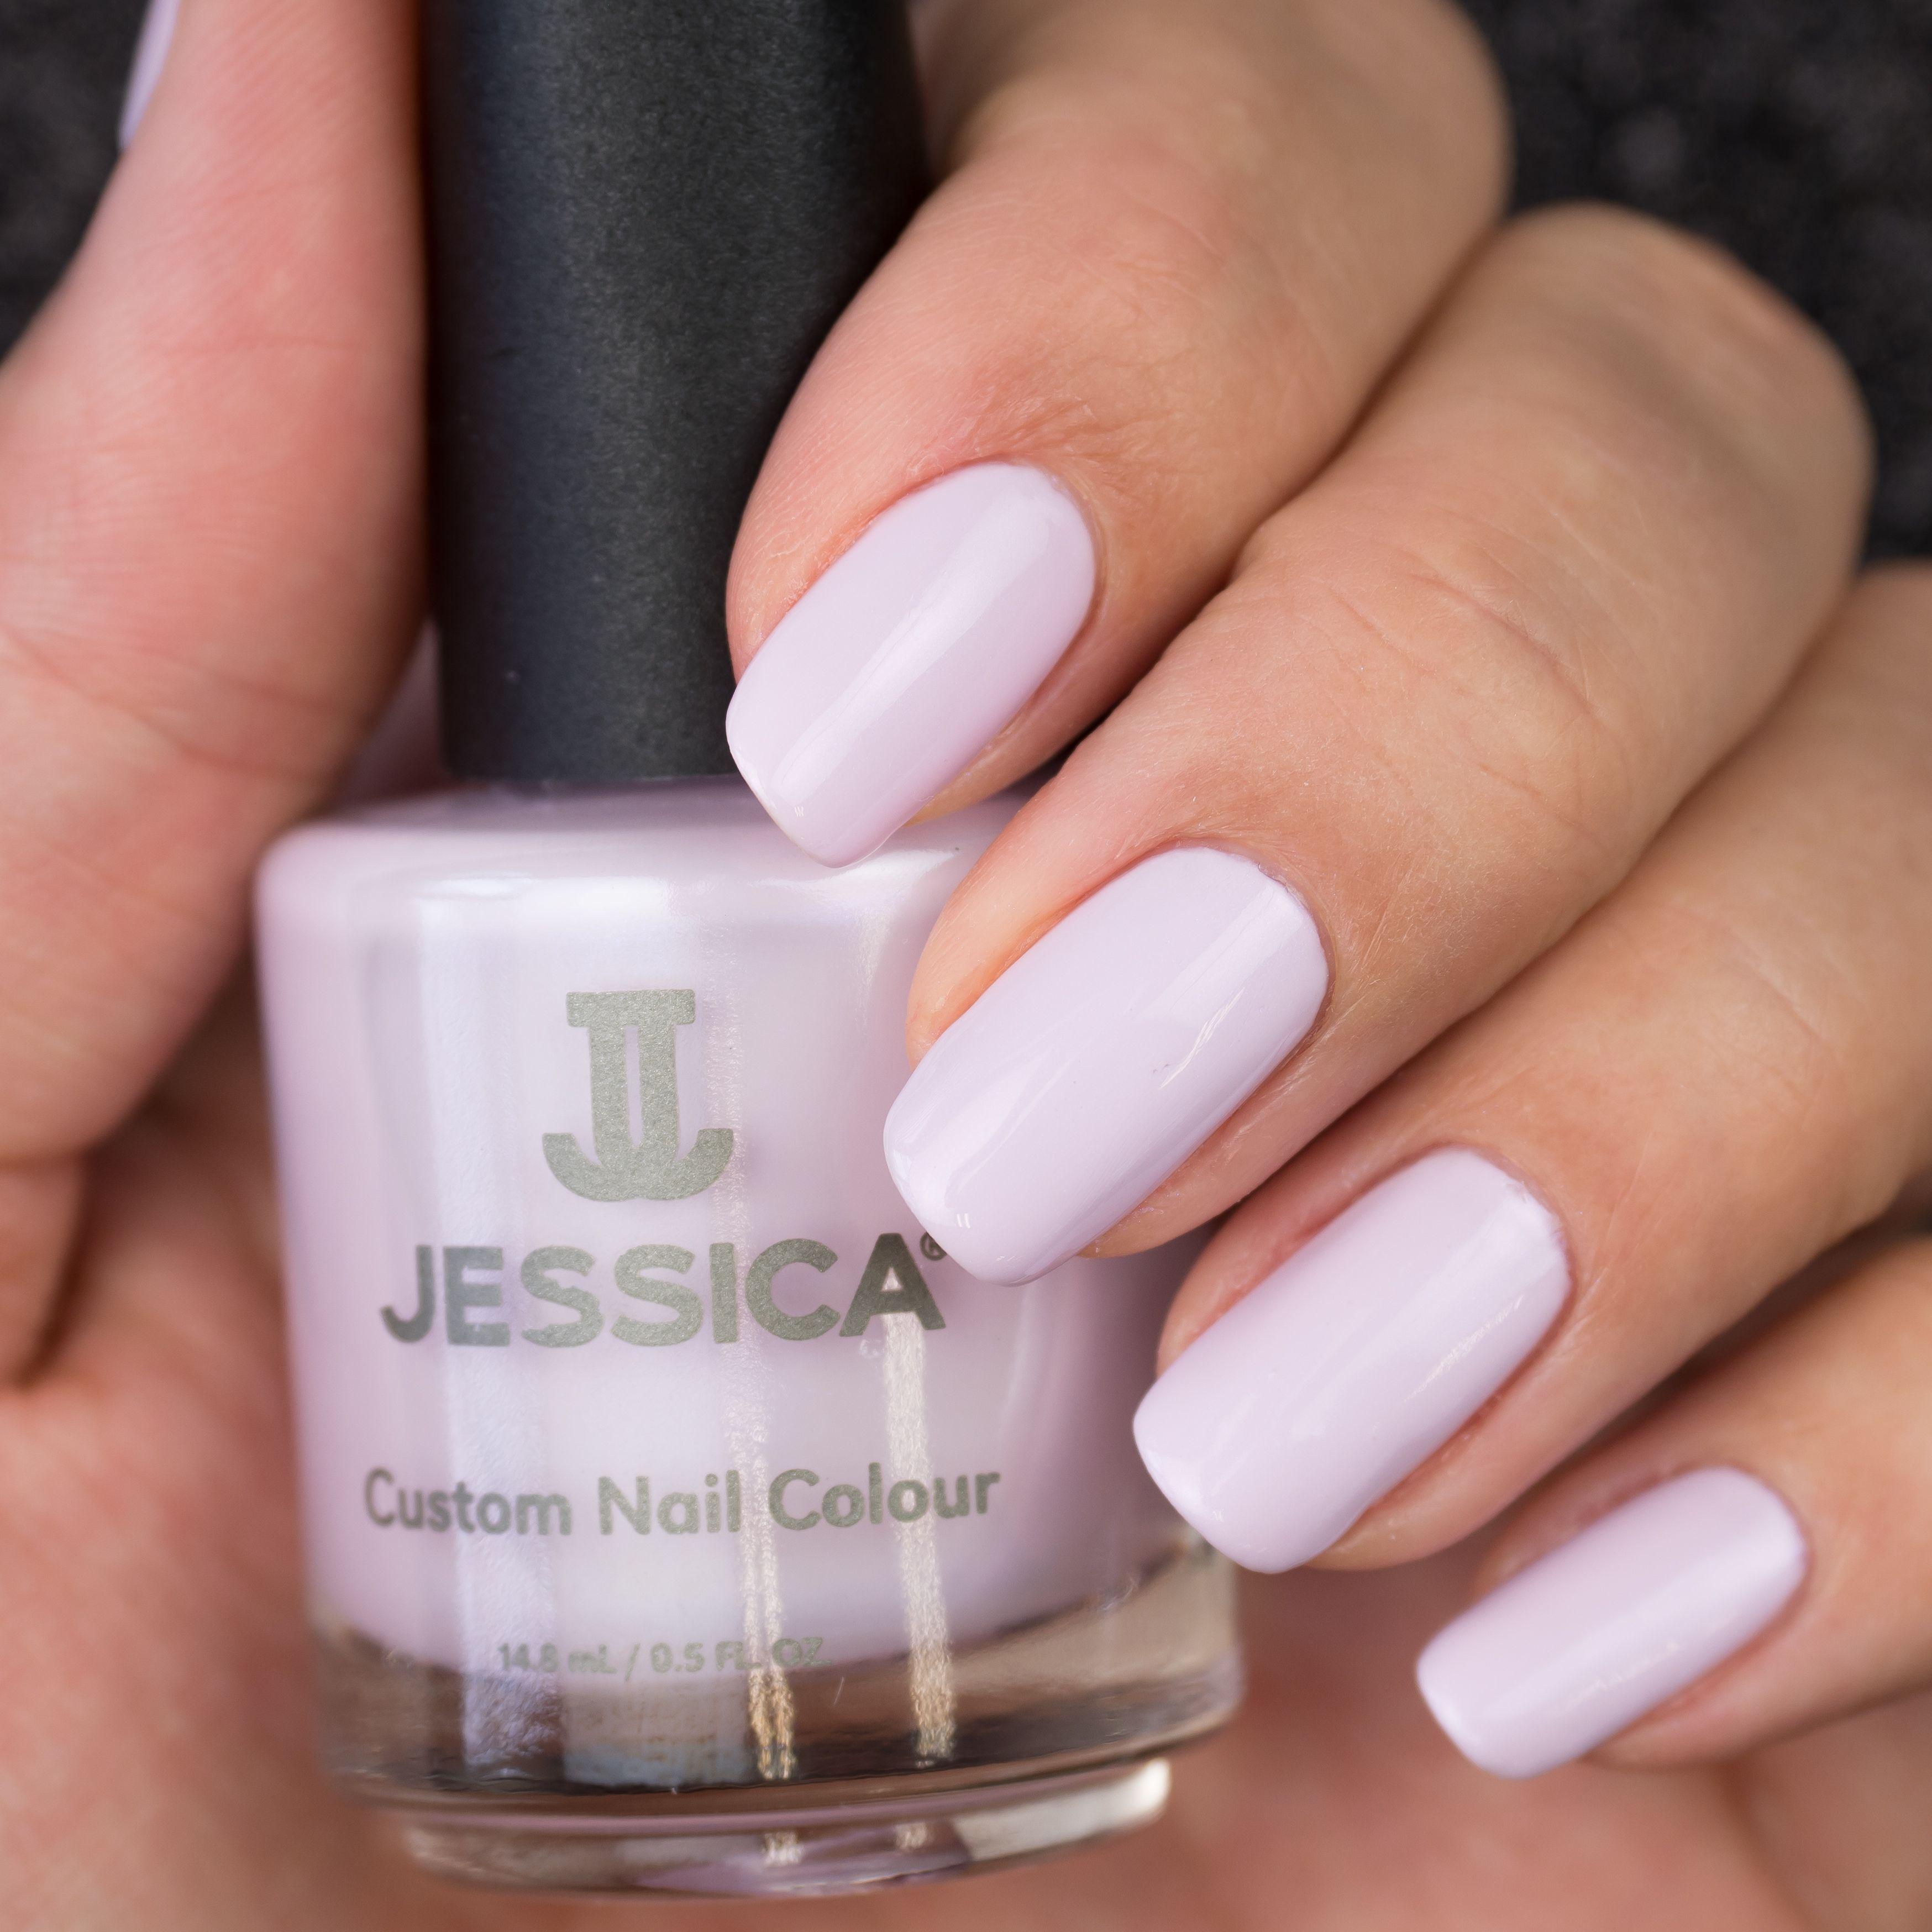 Lavender Lush - La Vie En Rose | Nails | Pinterest | LUSH, Jessica ...